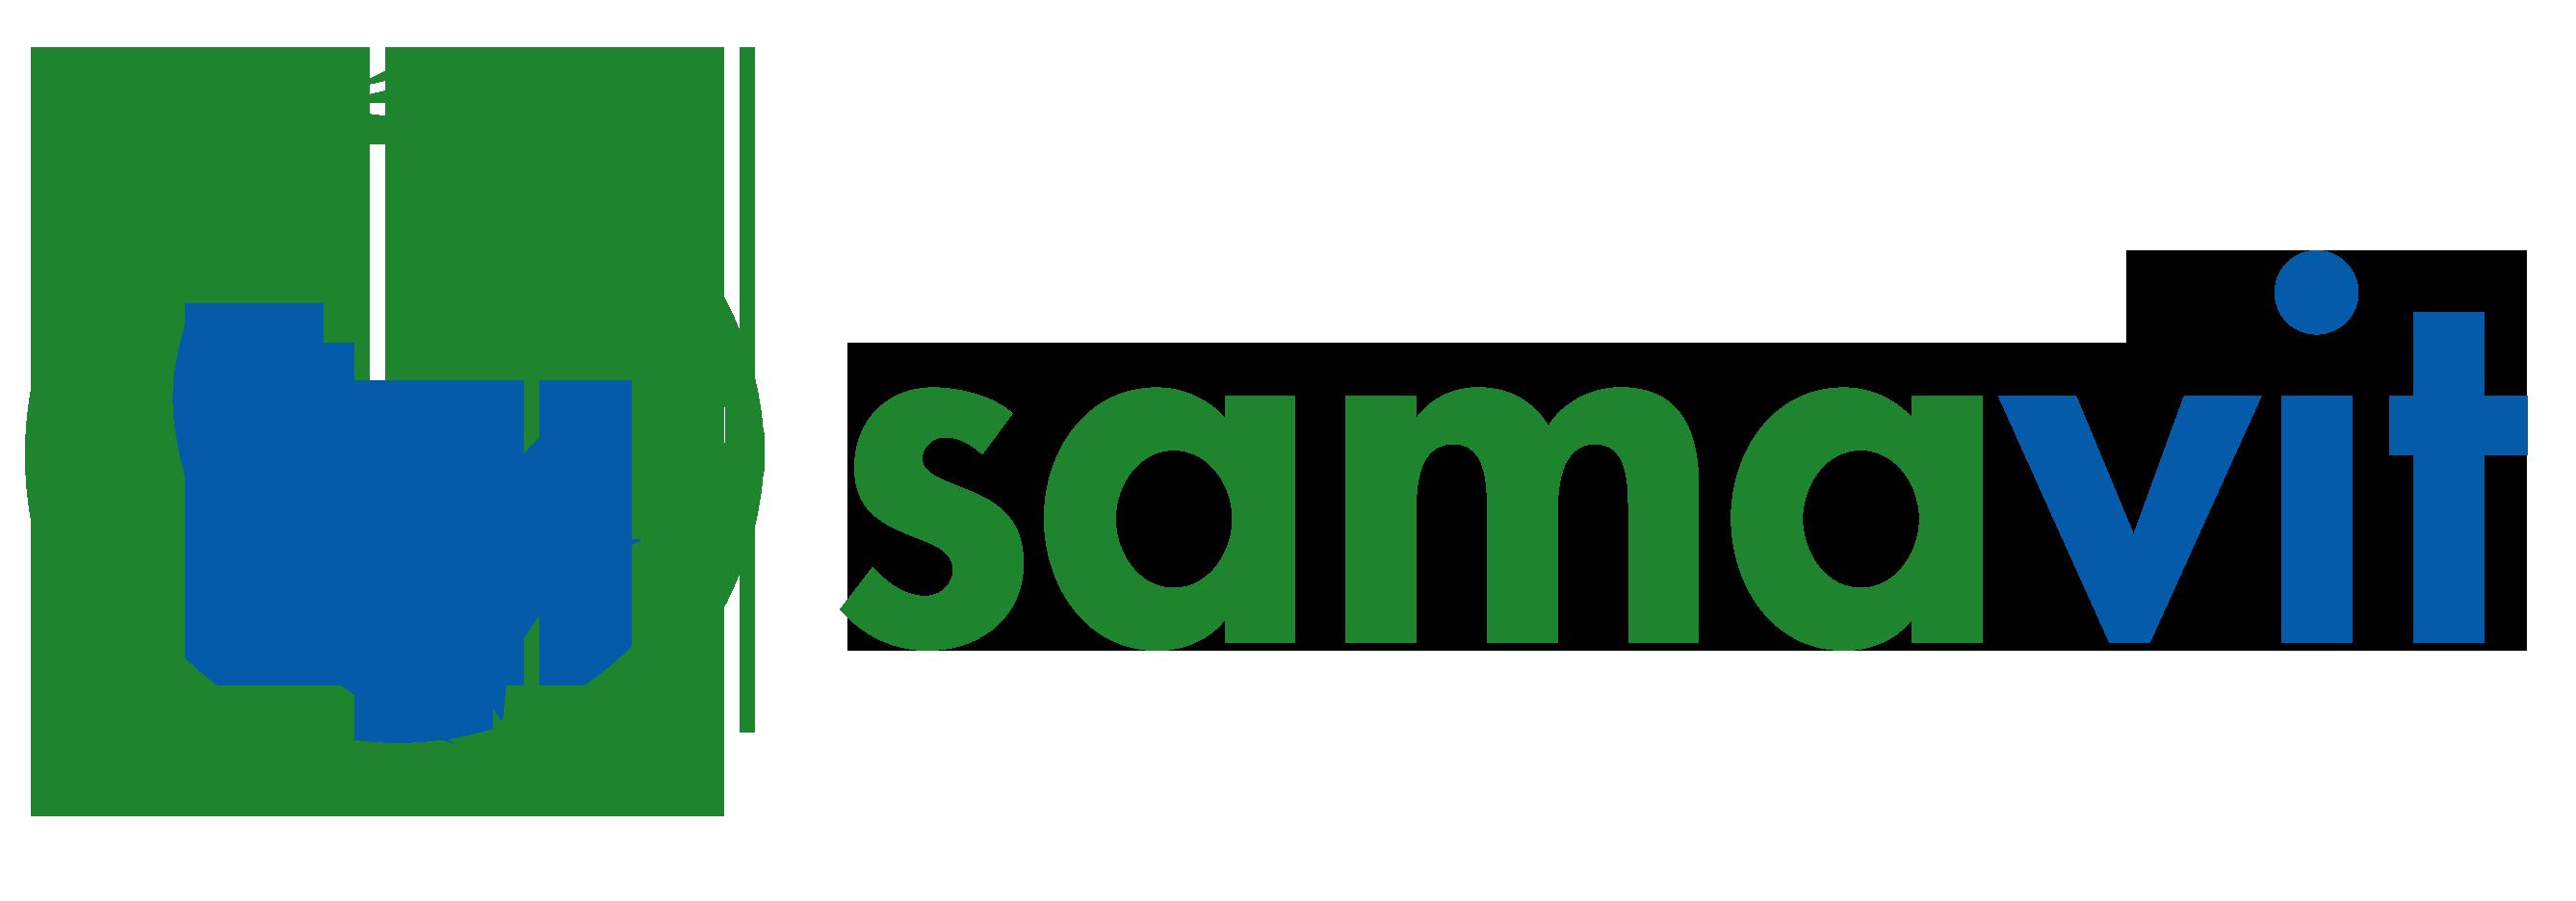 Samavit - Offering digital solutions for inclusive development